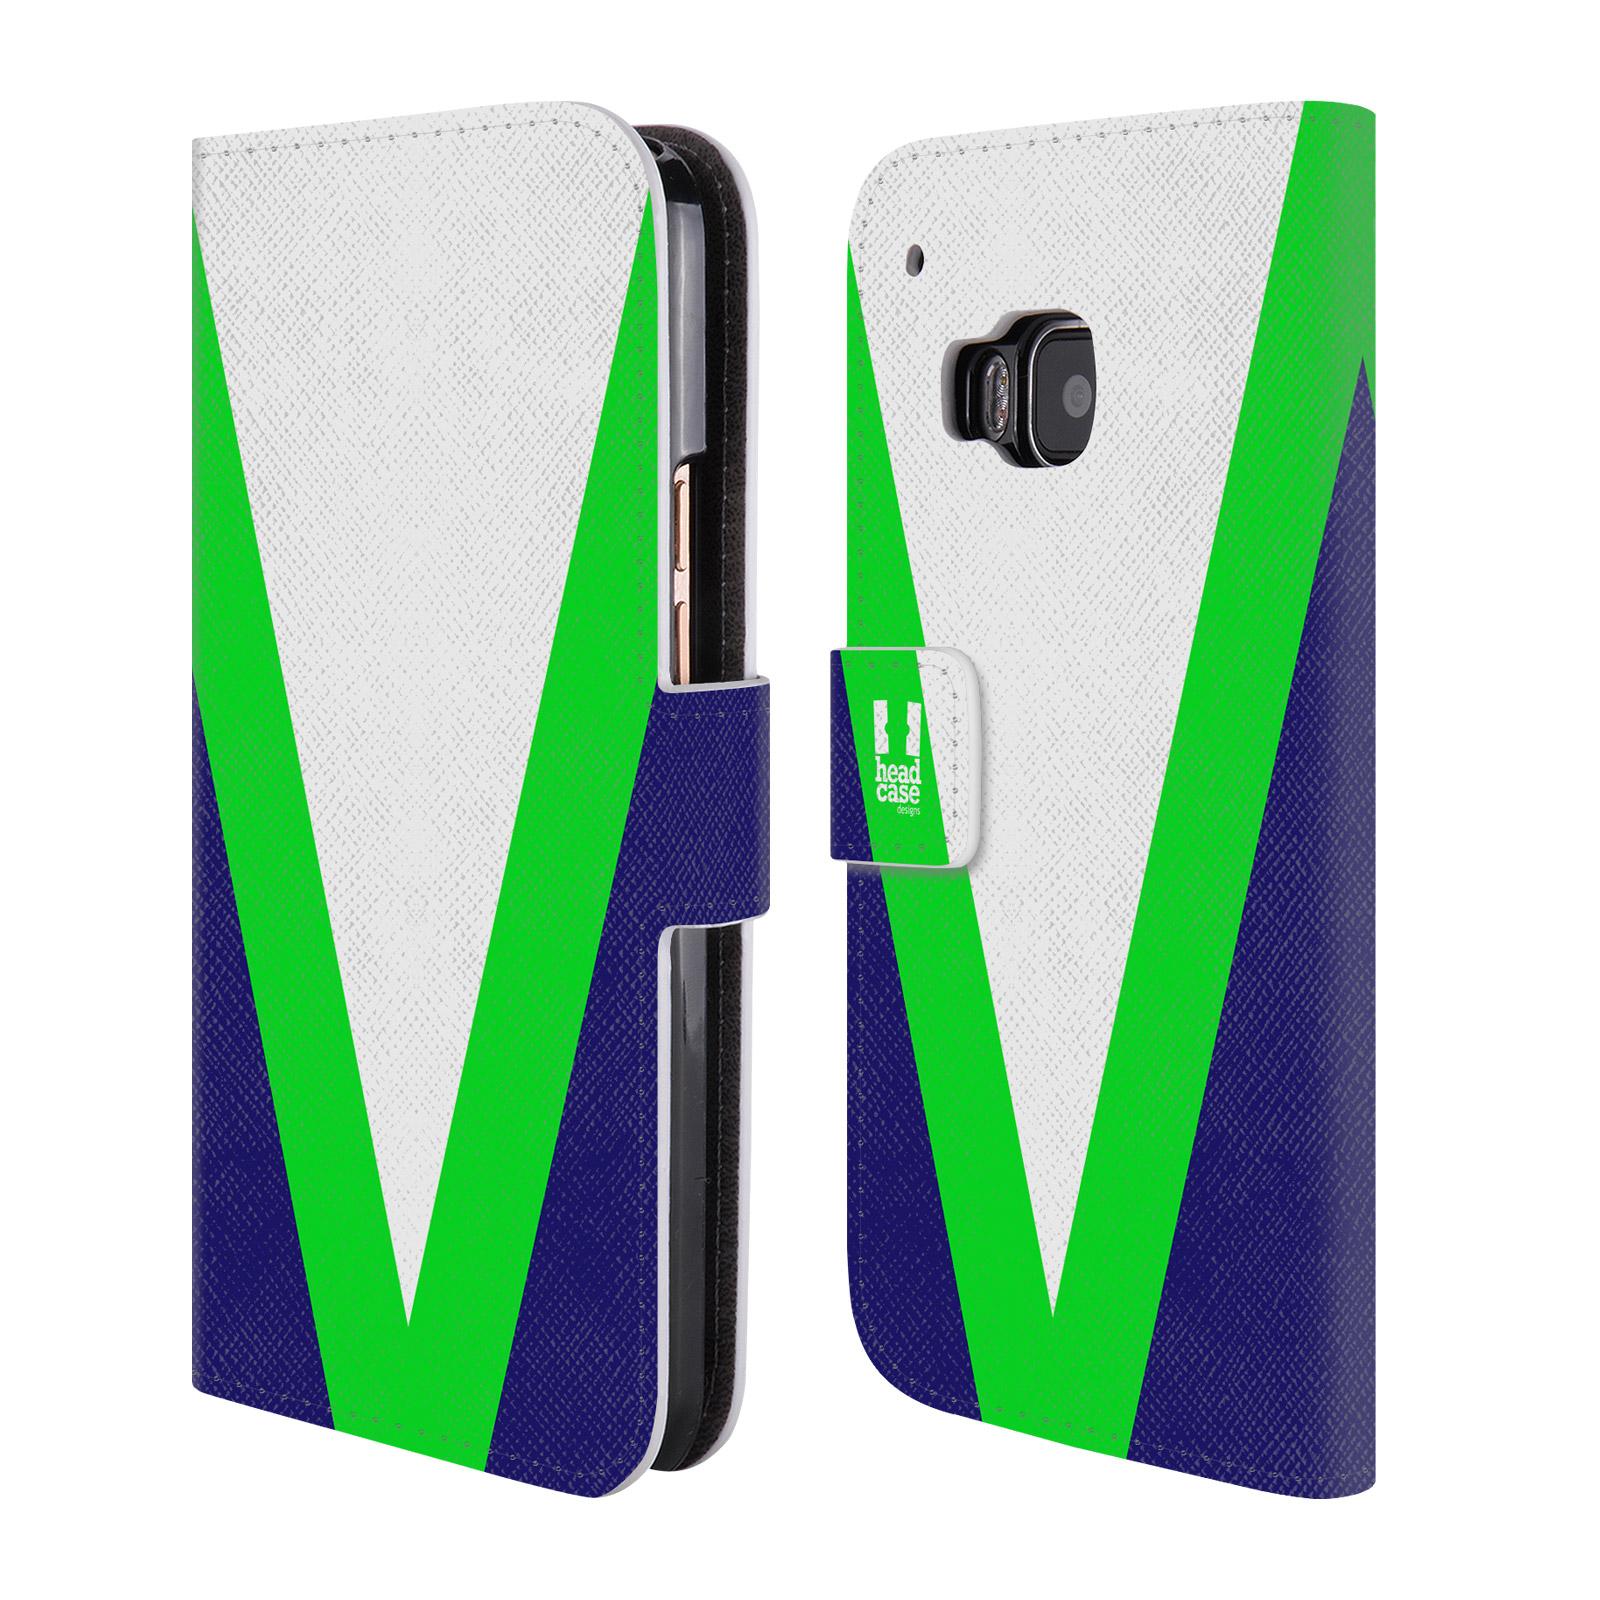 HEAD CASE Flipové pouzdro pro mobil HTC ONE M9 barevné tvary zelená a modrá